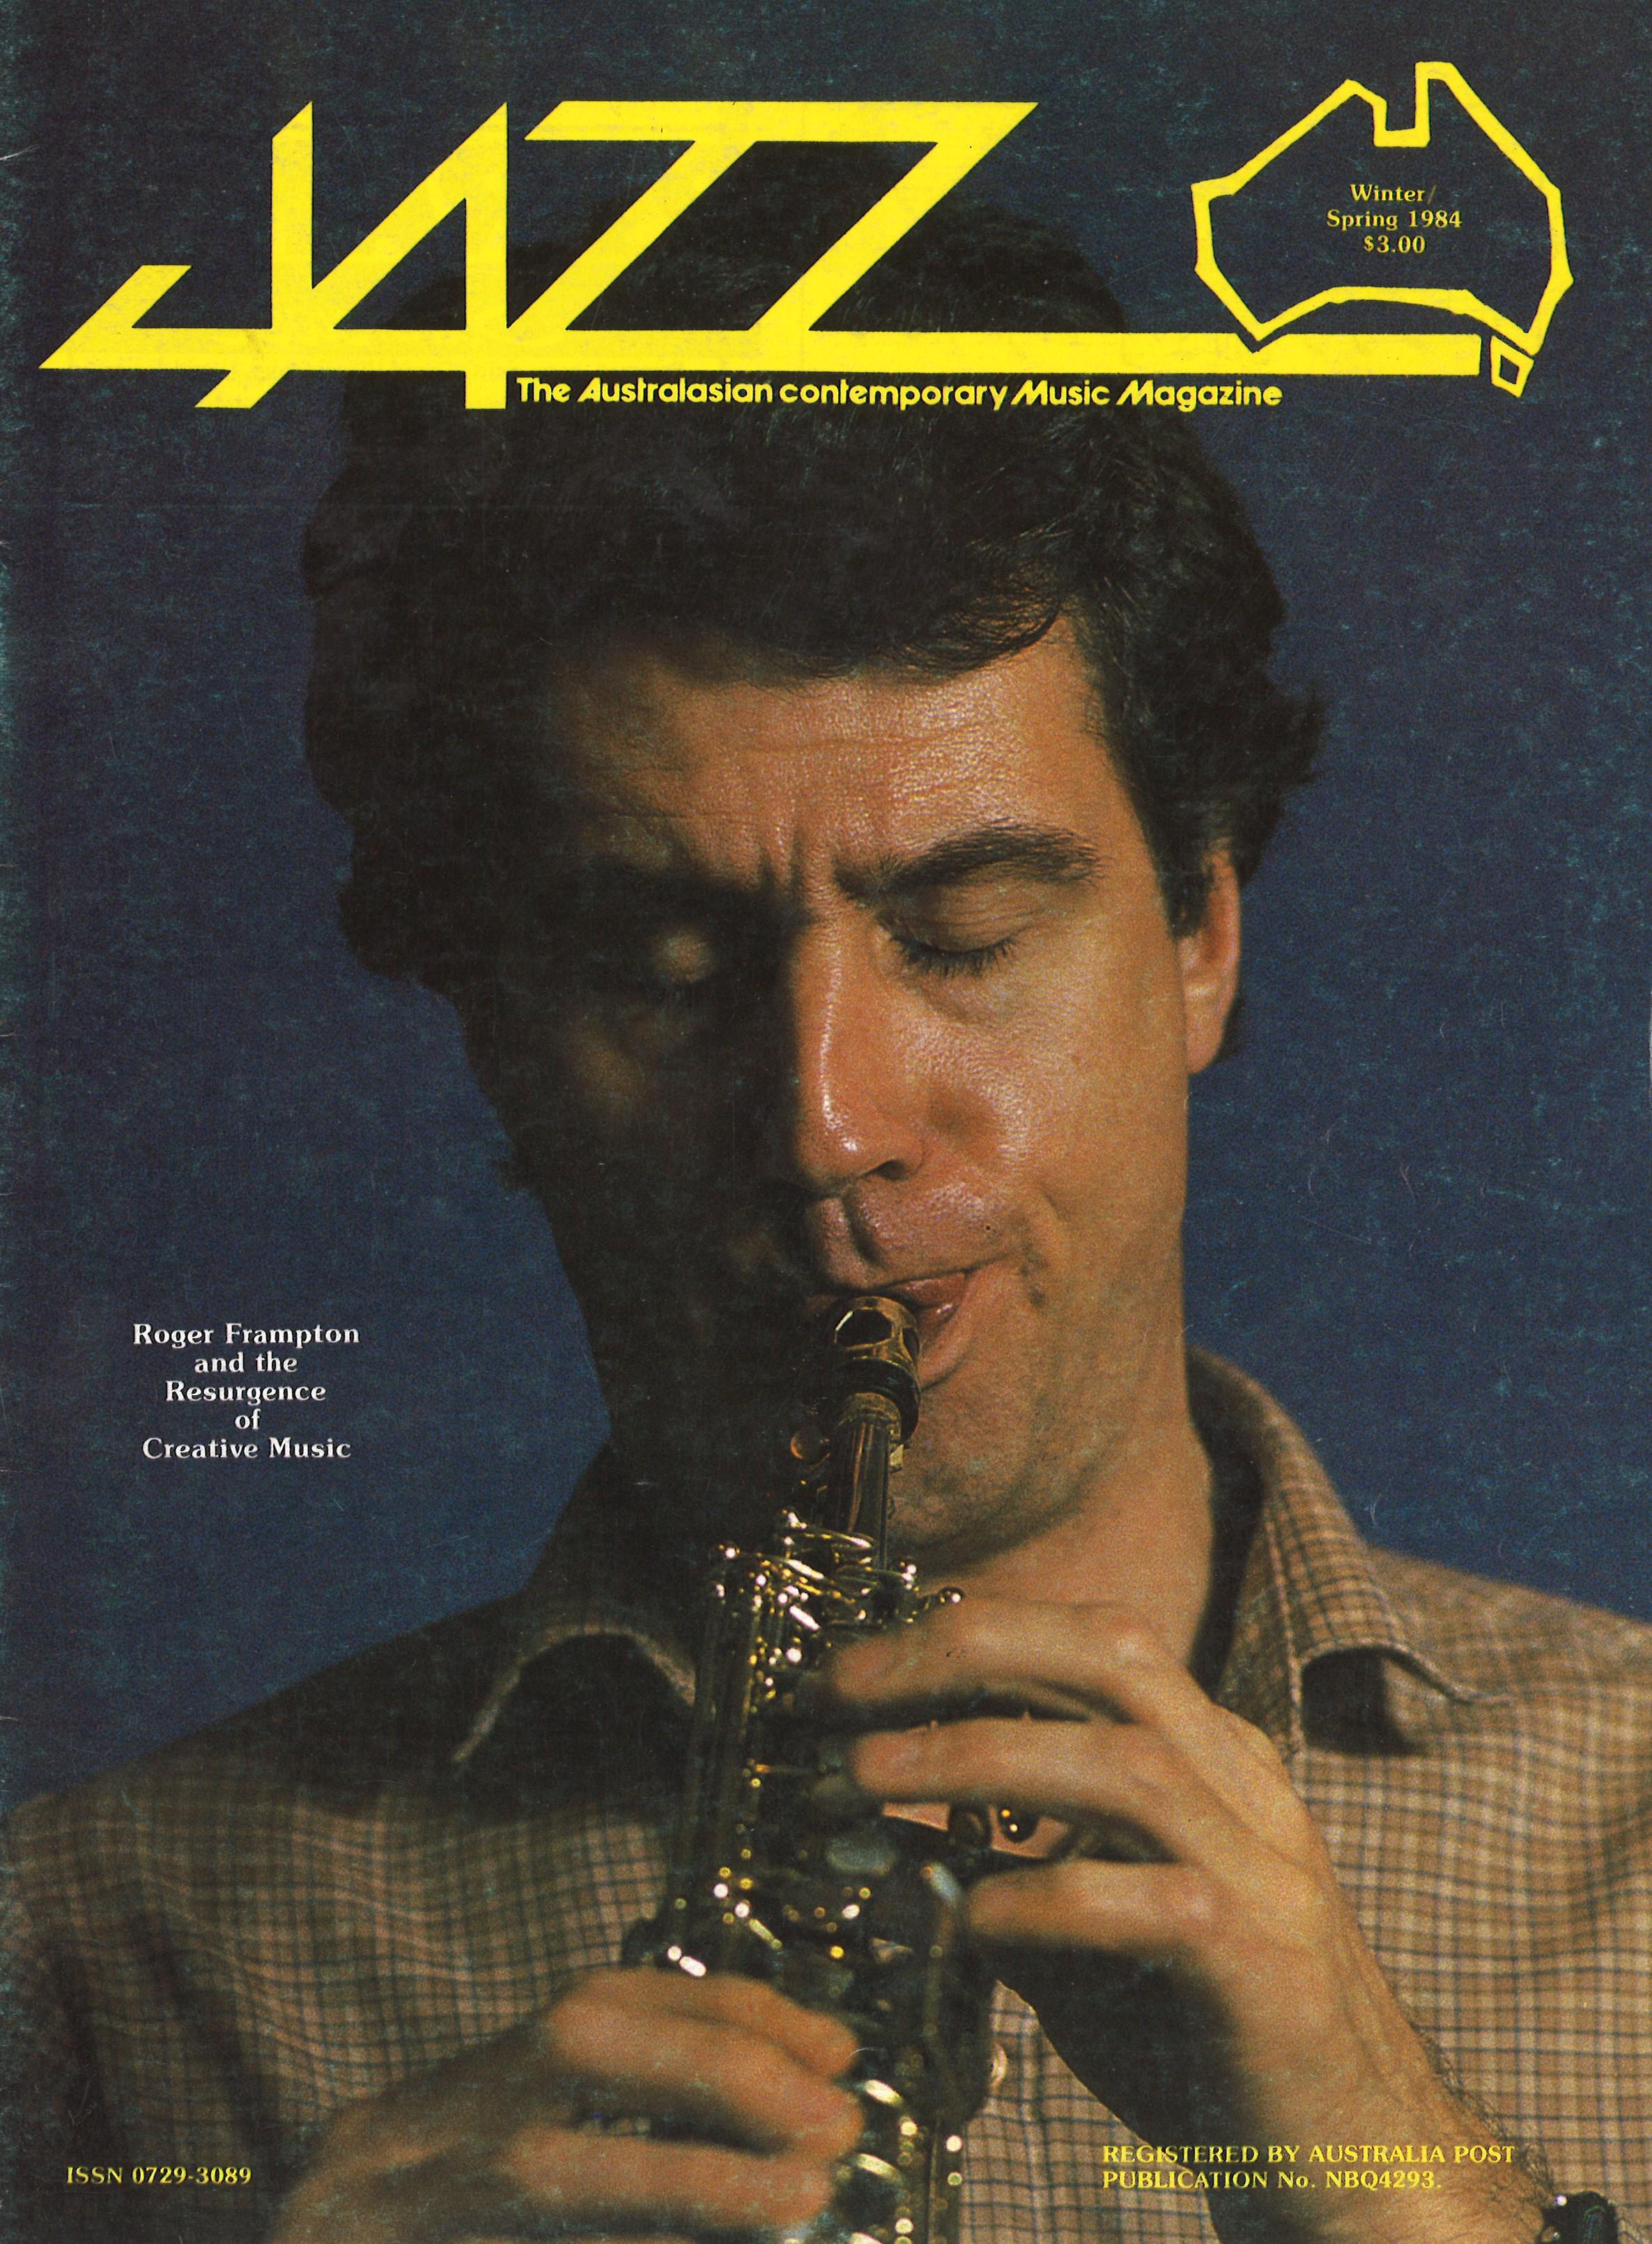 JazzMagazineWinterSpring84FrontCover (2).jpg